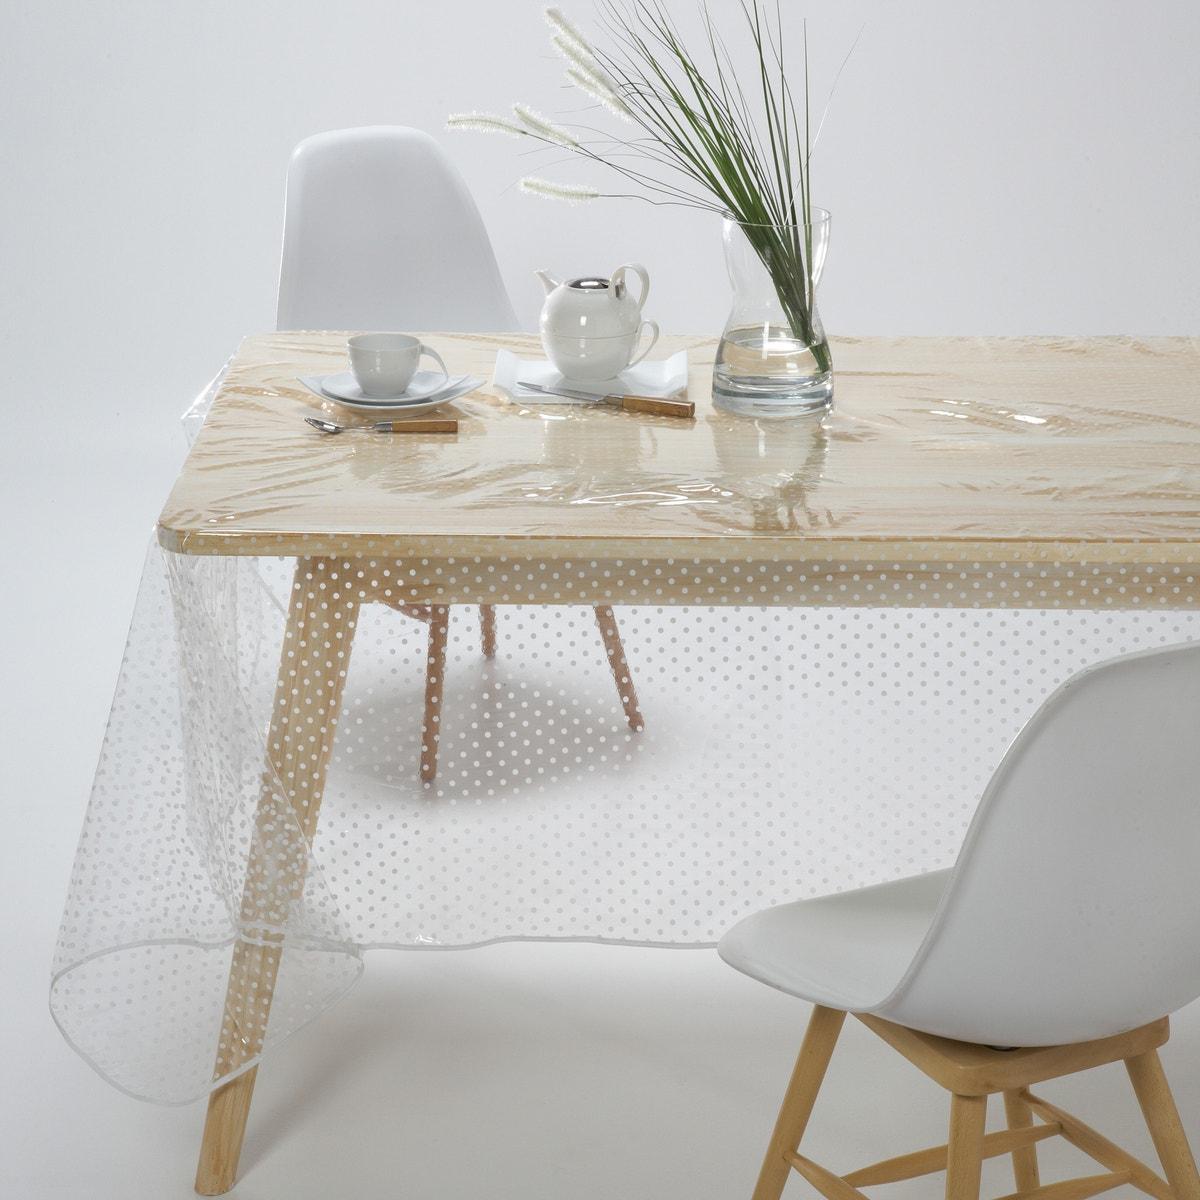 клеенка на стол для кухни виды идеи